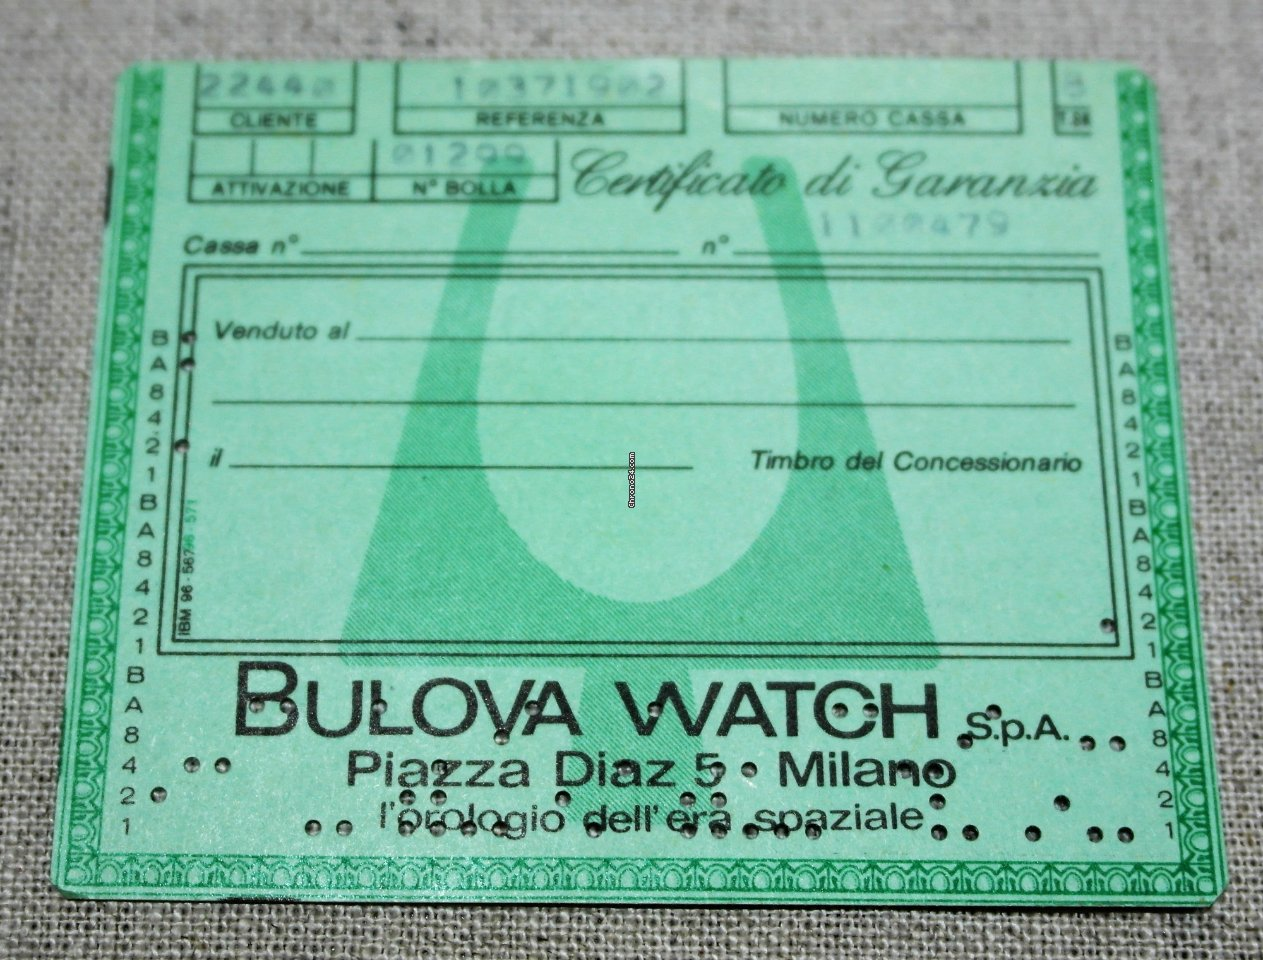 Bulova new